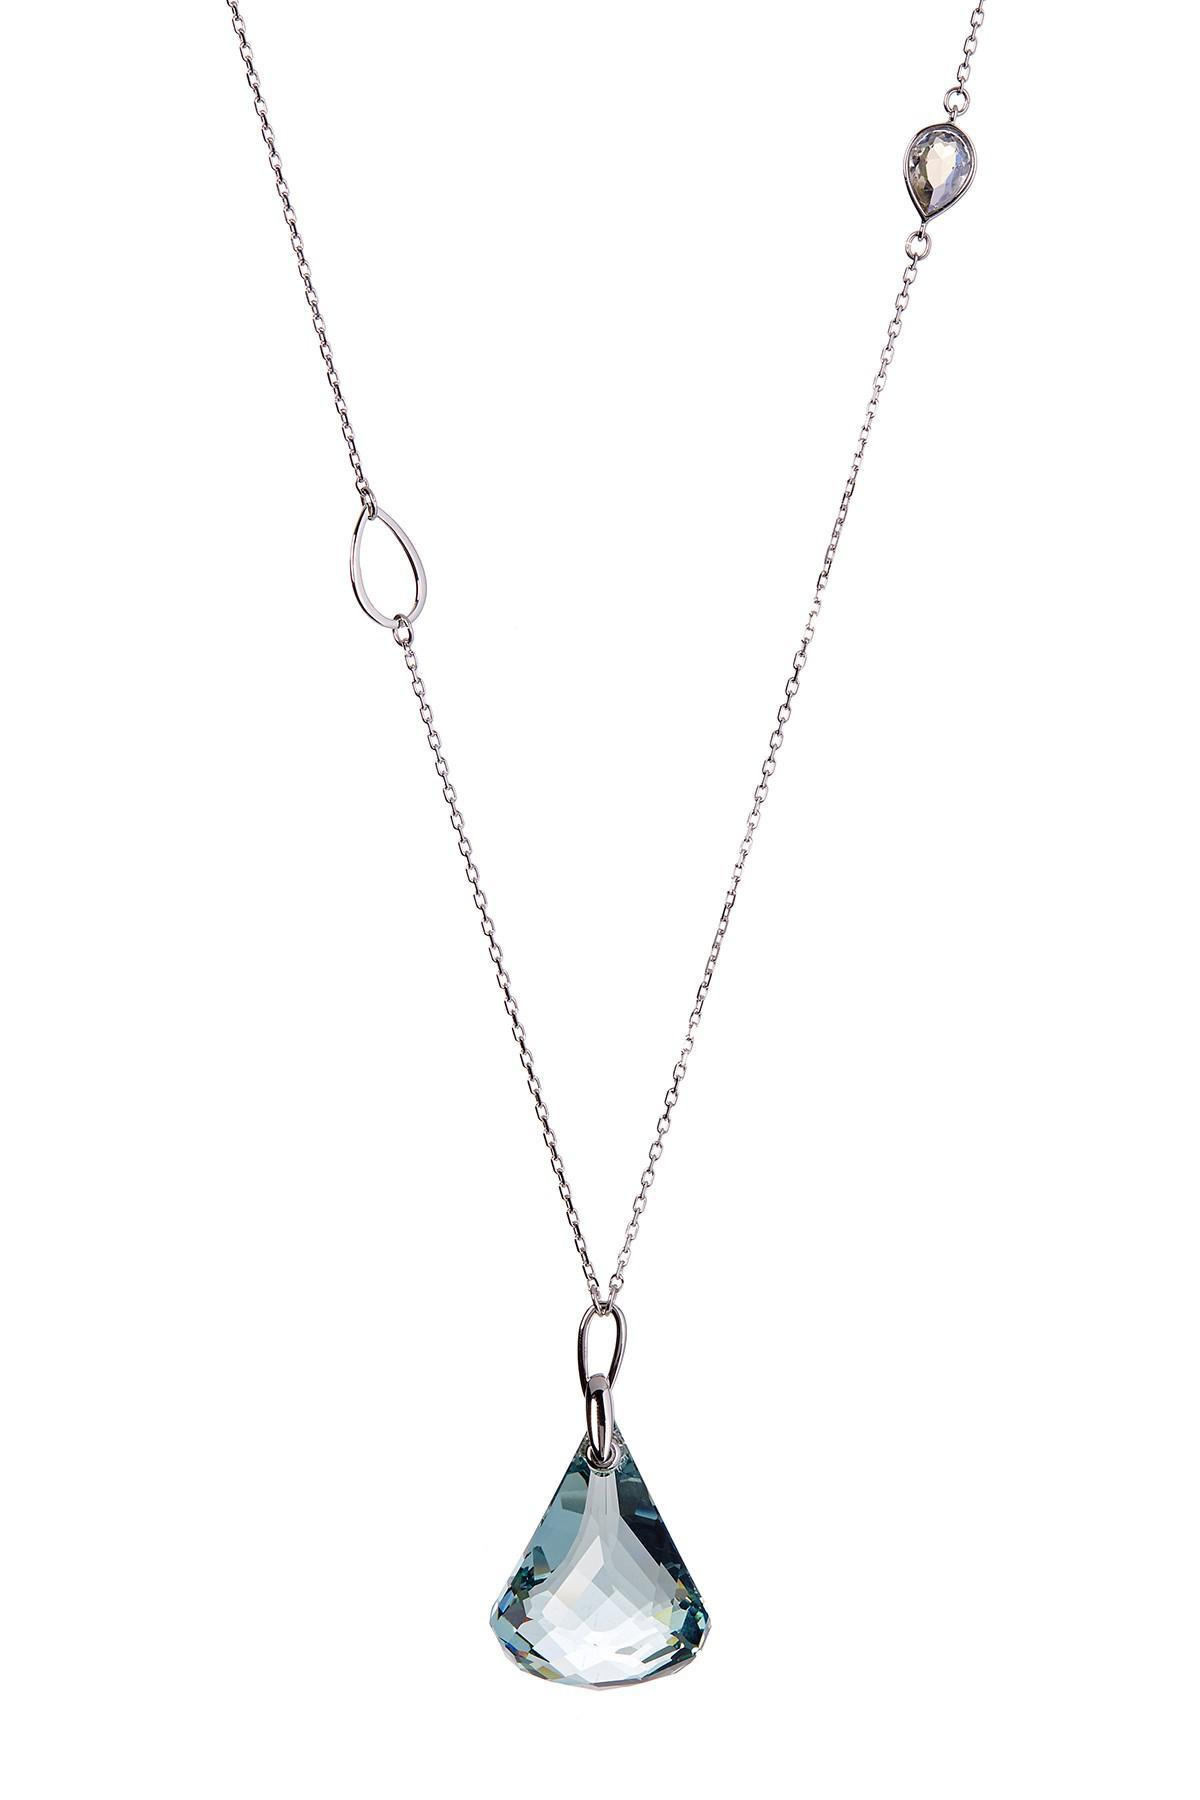 d1f2ed5fc2974b Swarovski Lunar Moonlight Crystal Pendant Necklace in Blue - Lyst